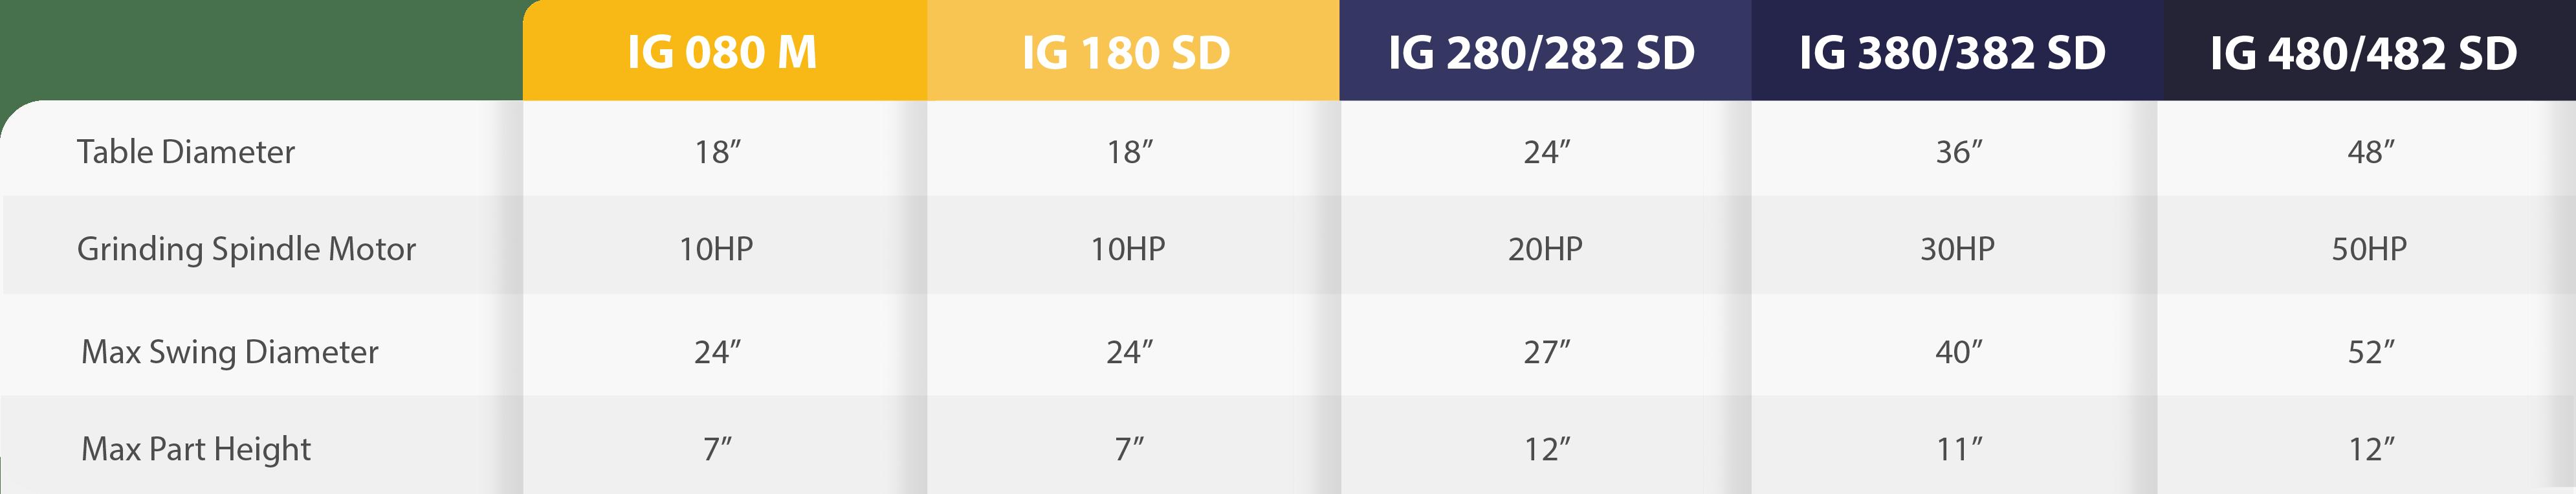 IG-Series Chart-2